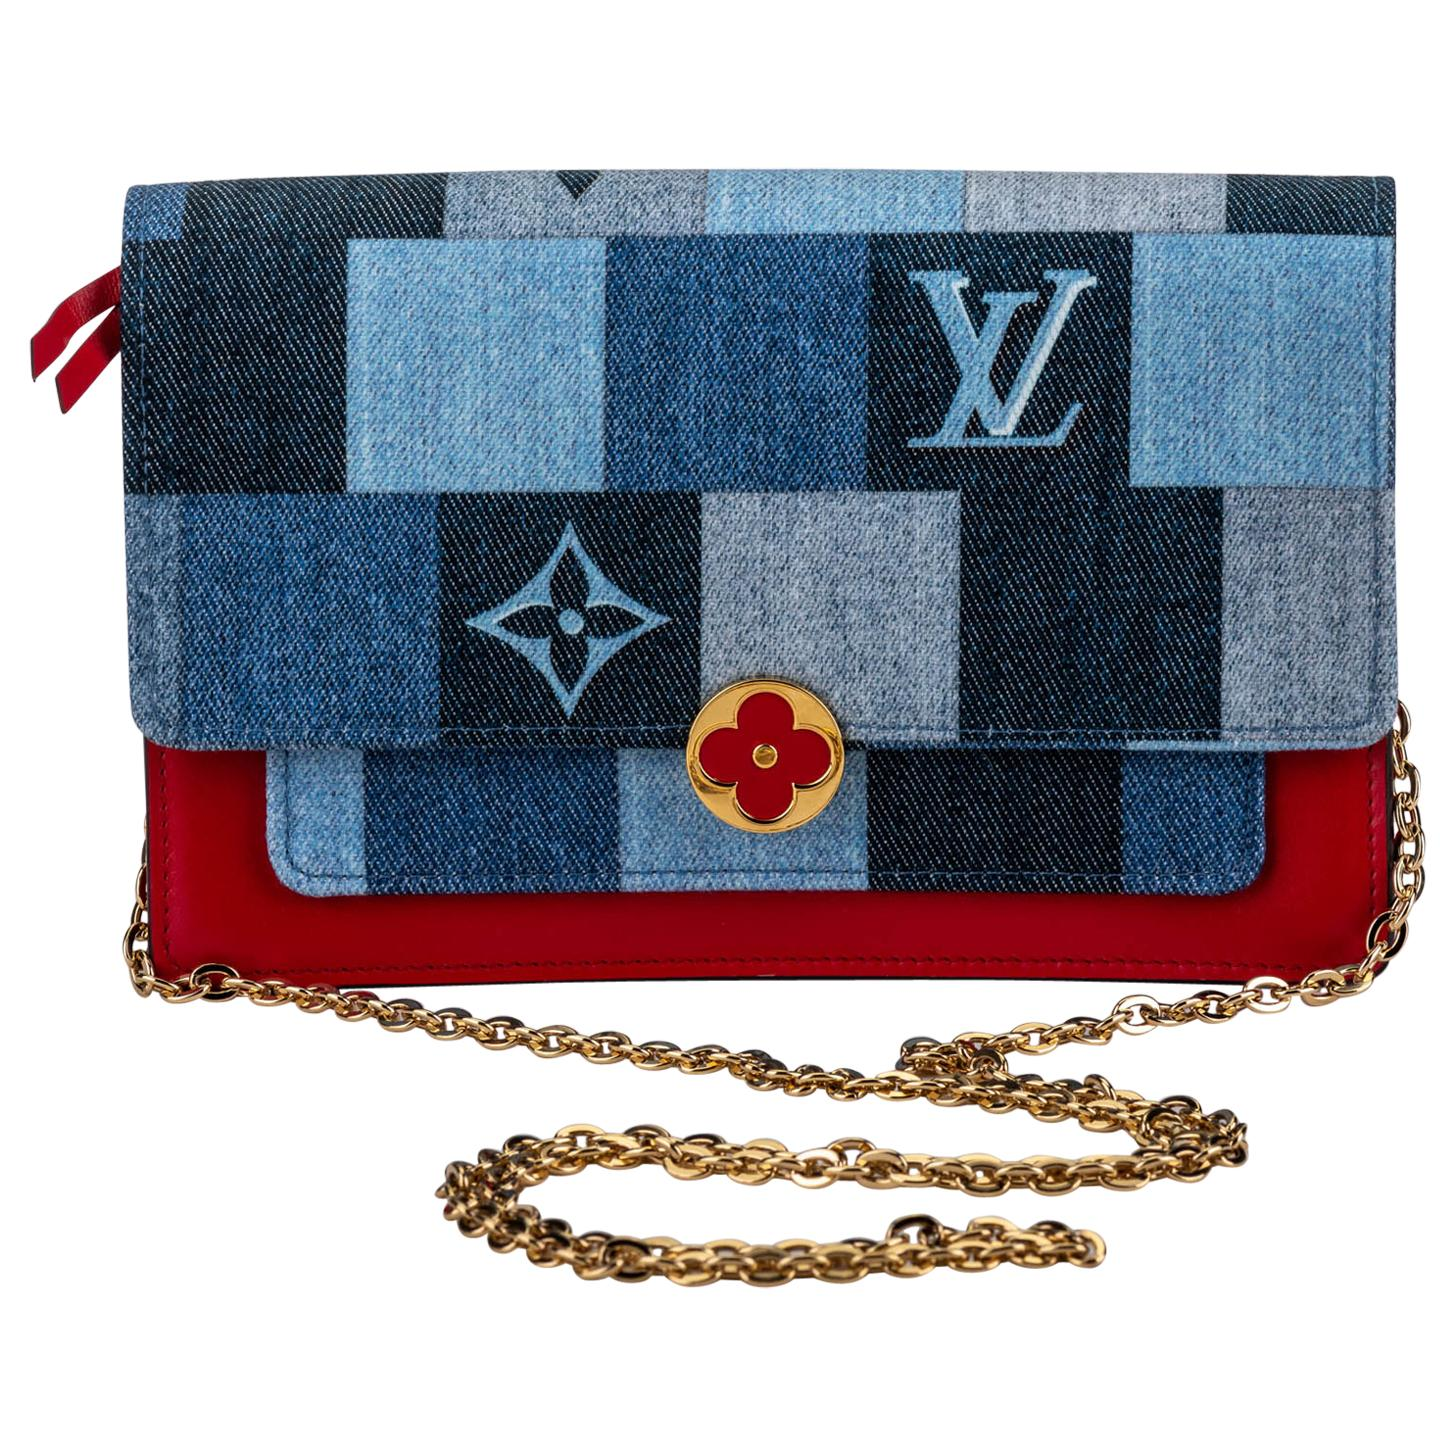 New in Box Louis Vuitton Denim Crossbody Bag